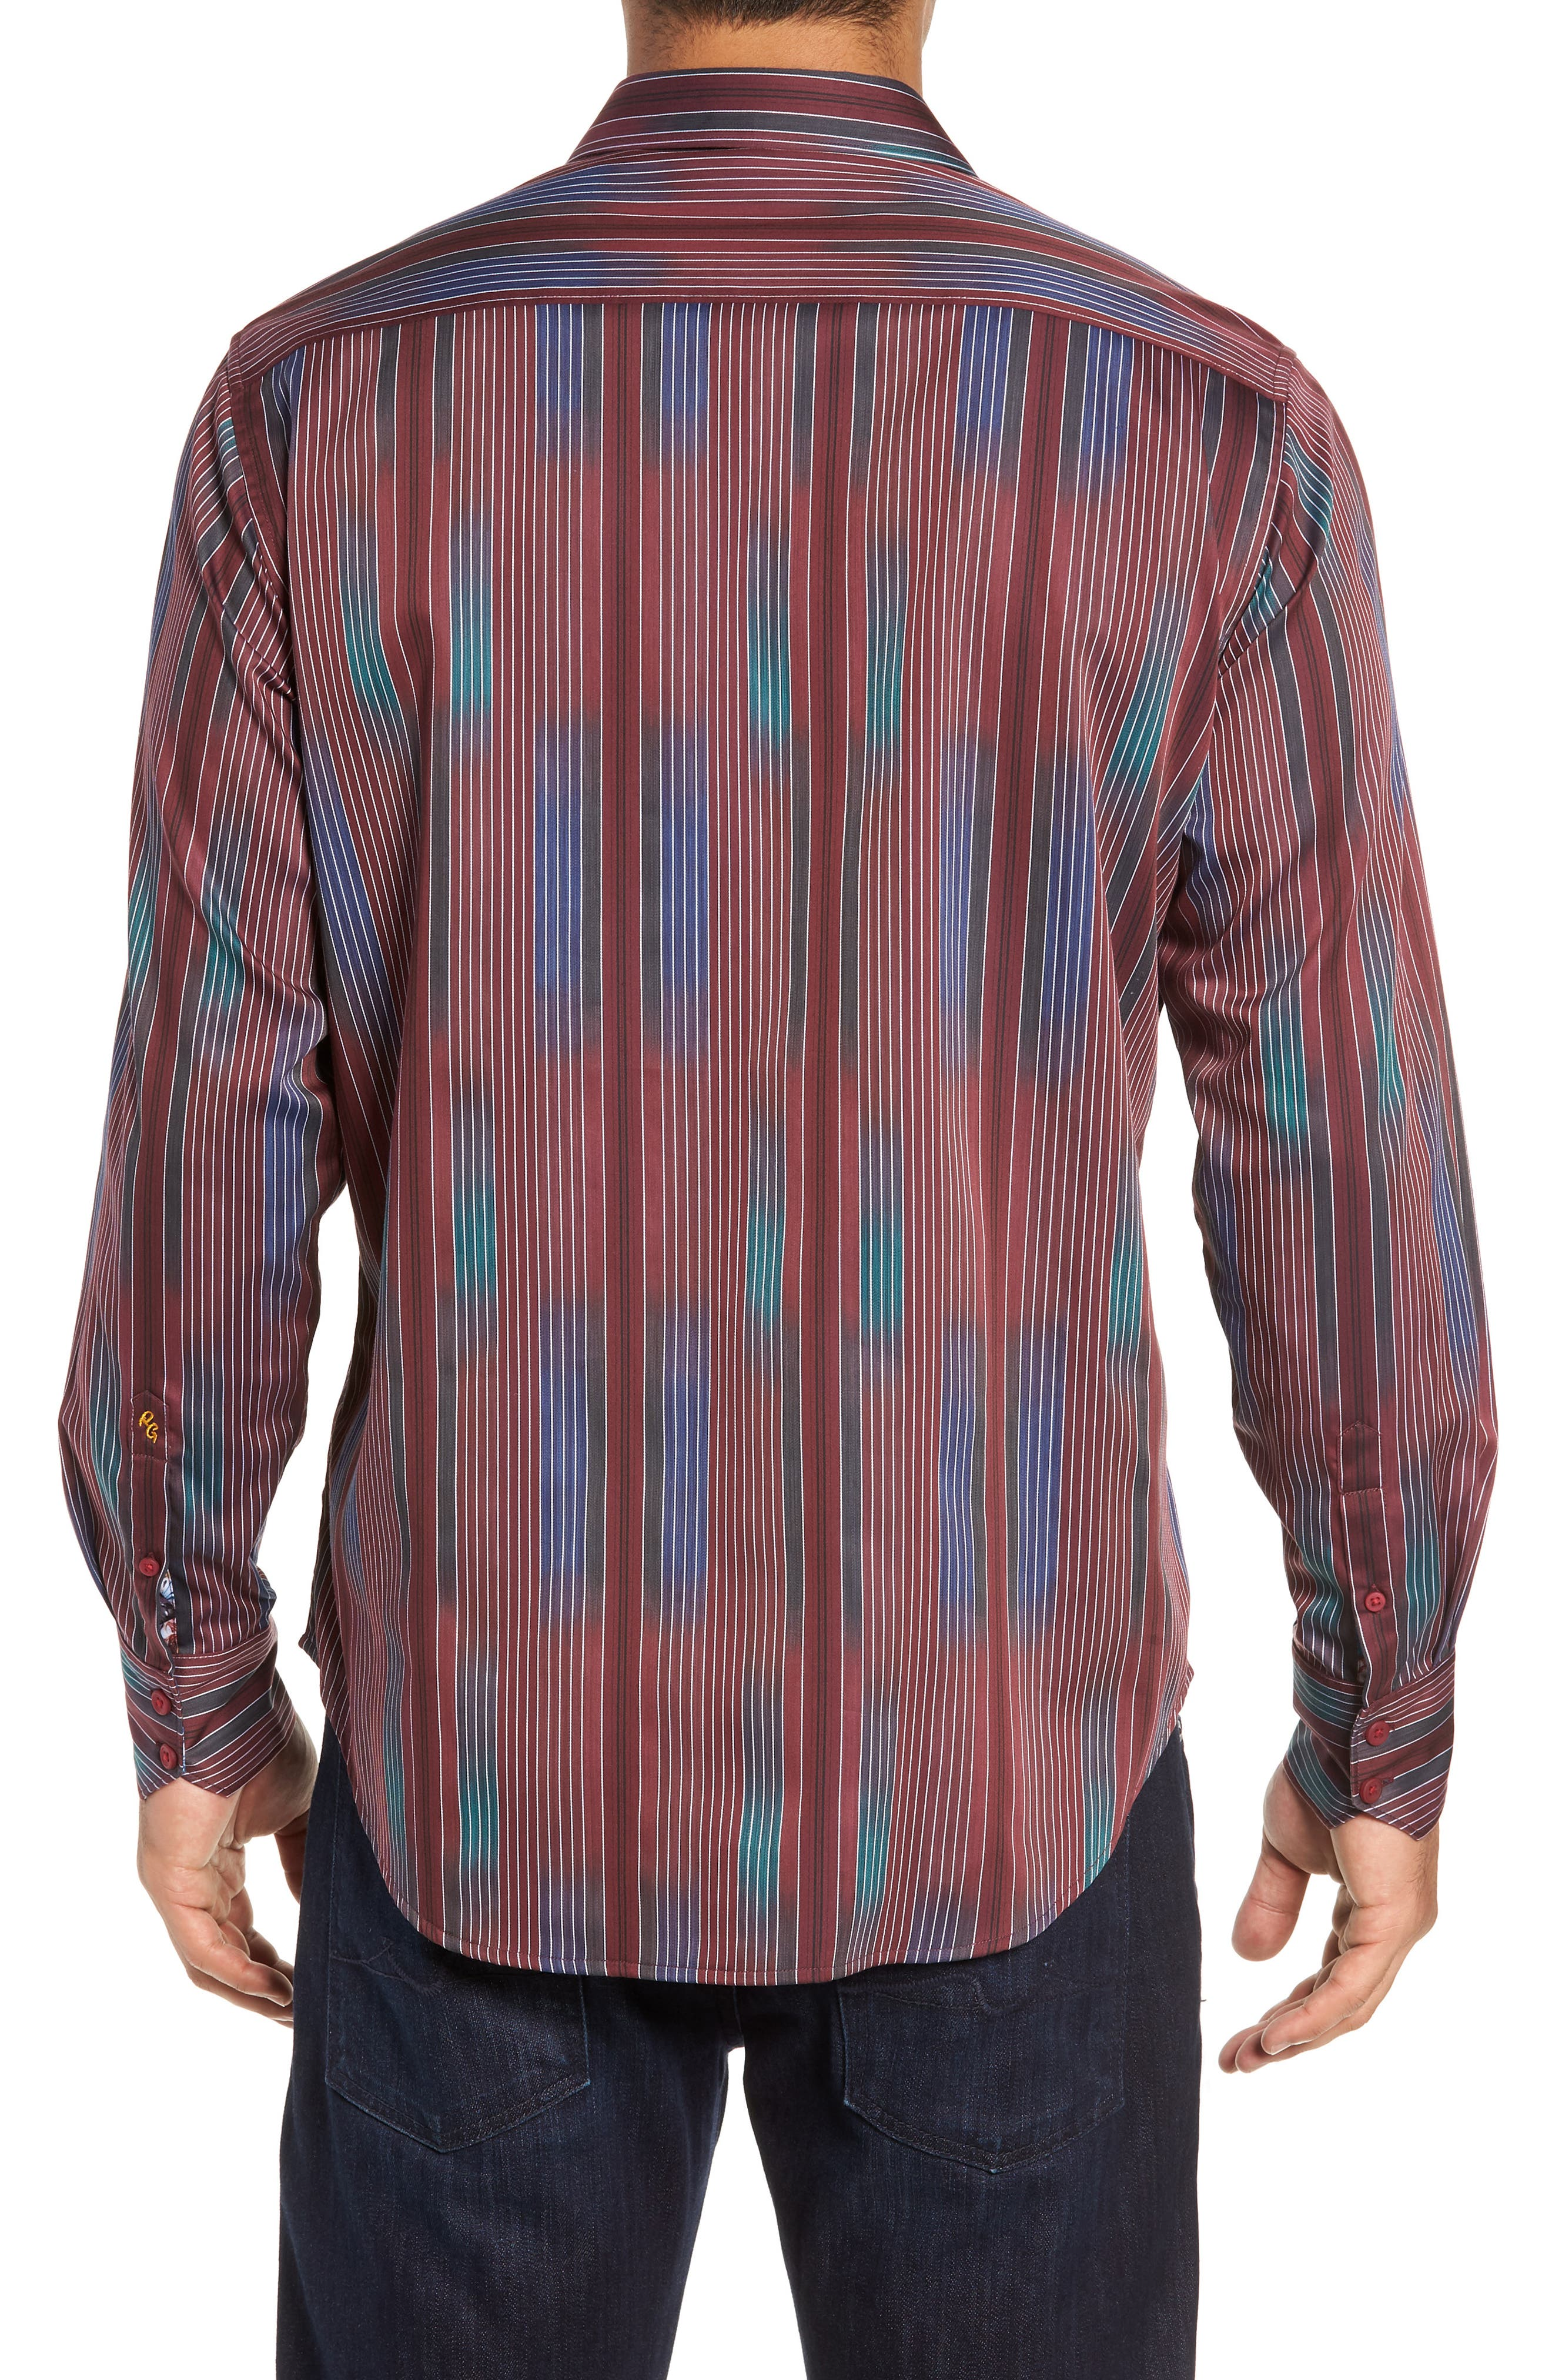 Rahman Classic Fit Sport Shirt,                             Alternate thumbnail 3, color,                             BURGUNDY